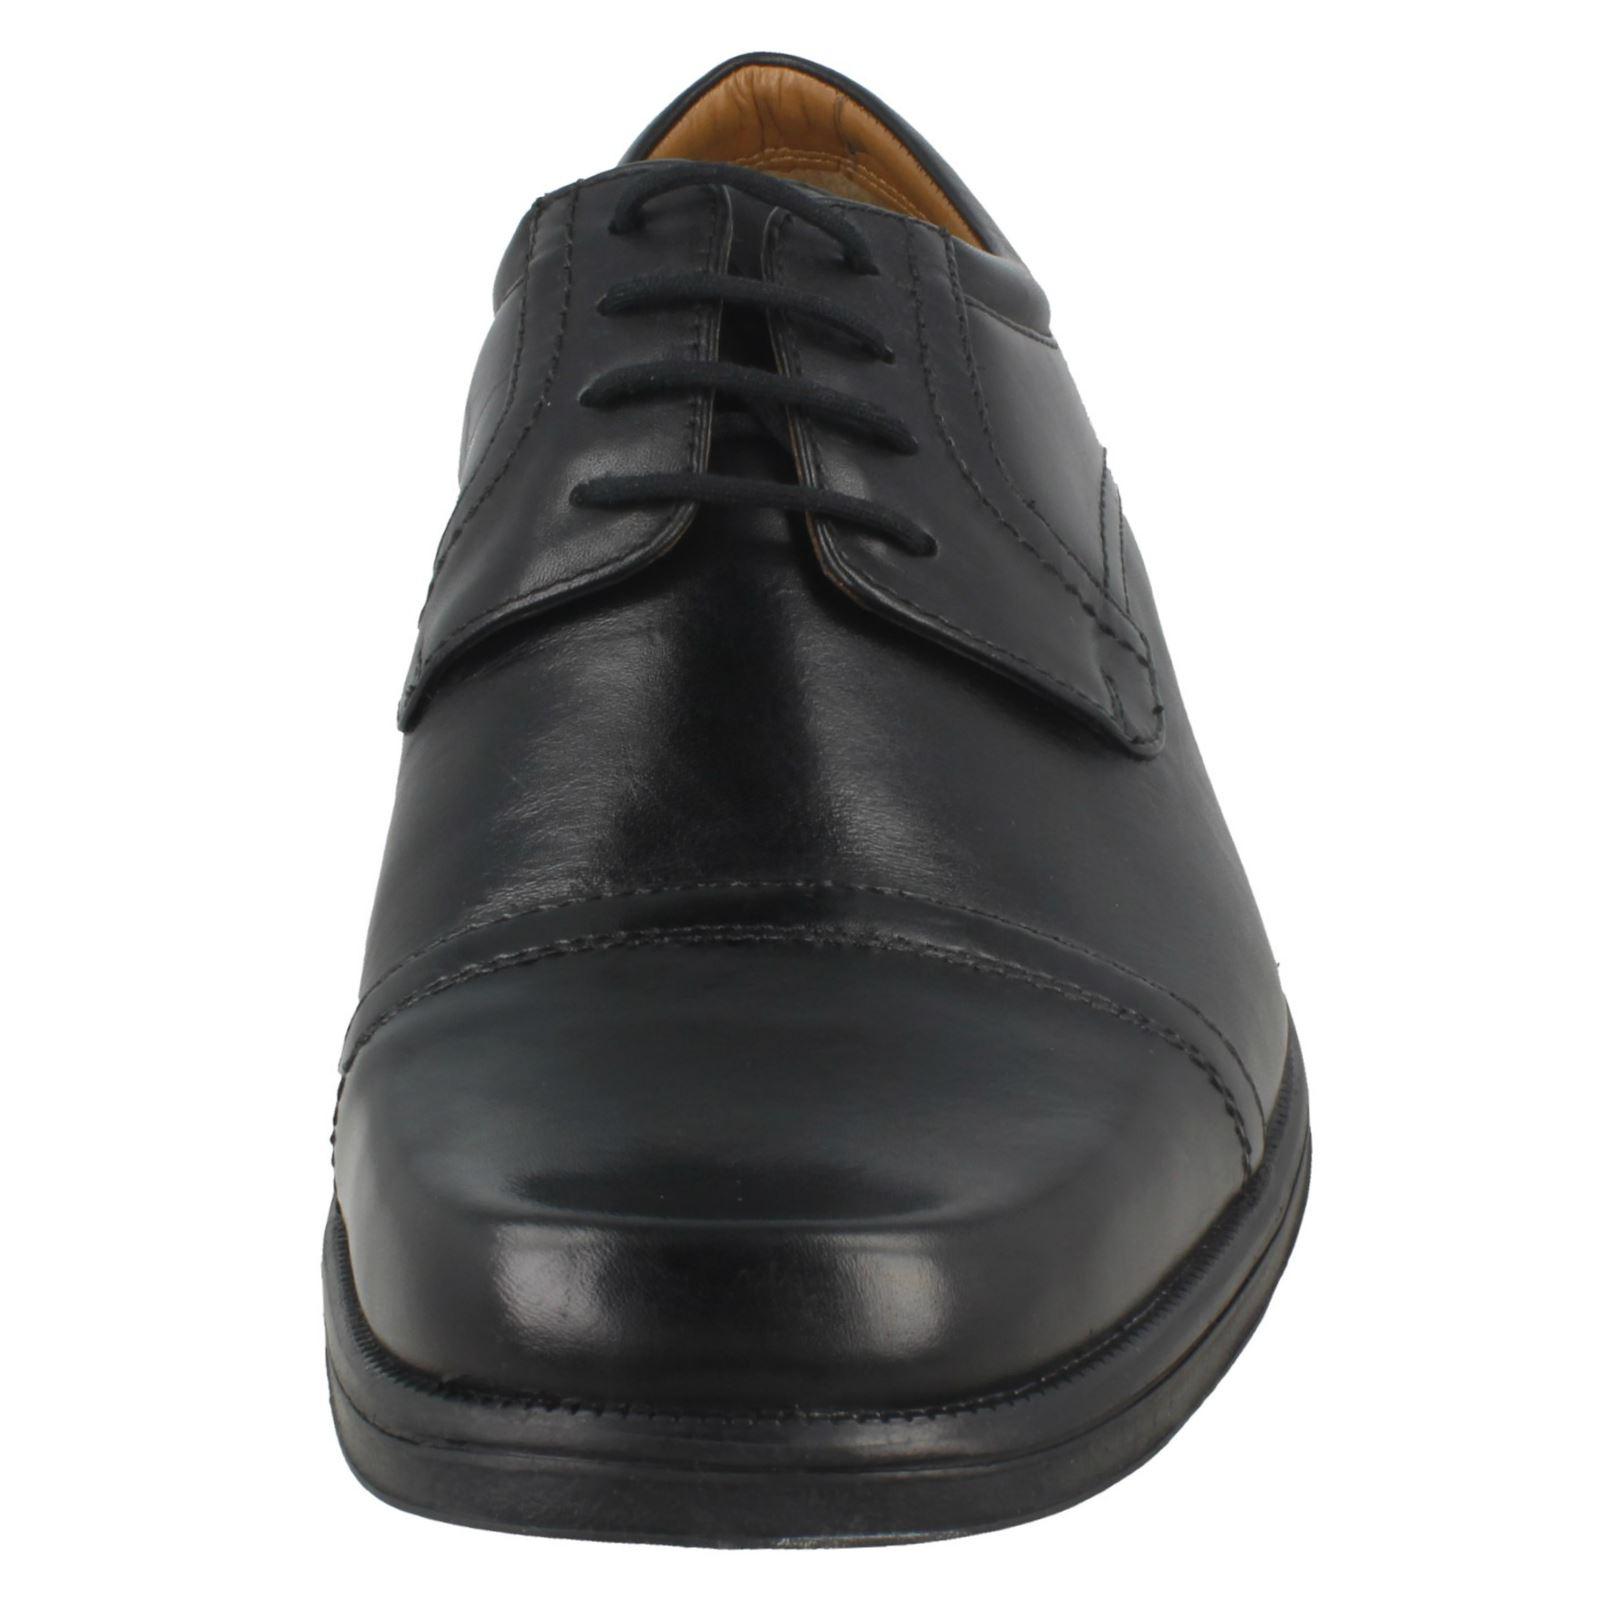 Herren Clarks Harpcap Lace Up Formal Formal Formal Schuhes 8de5b7